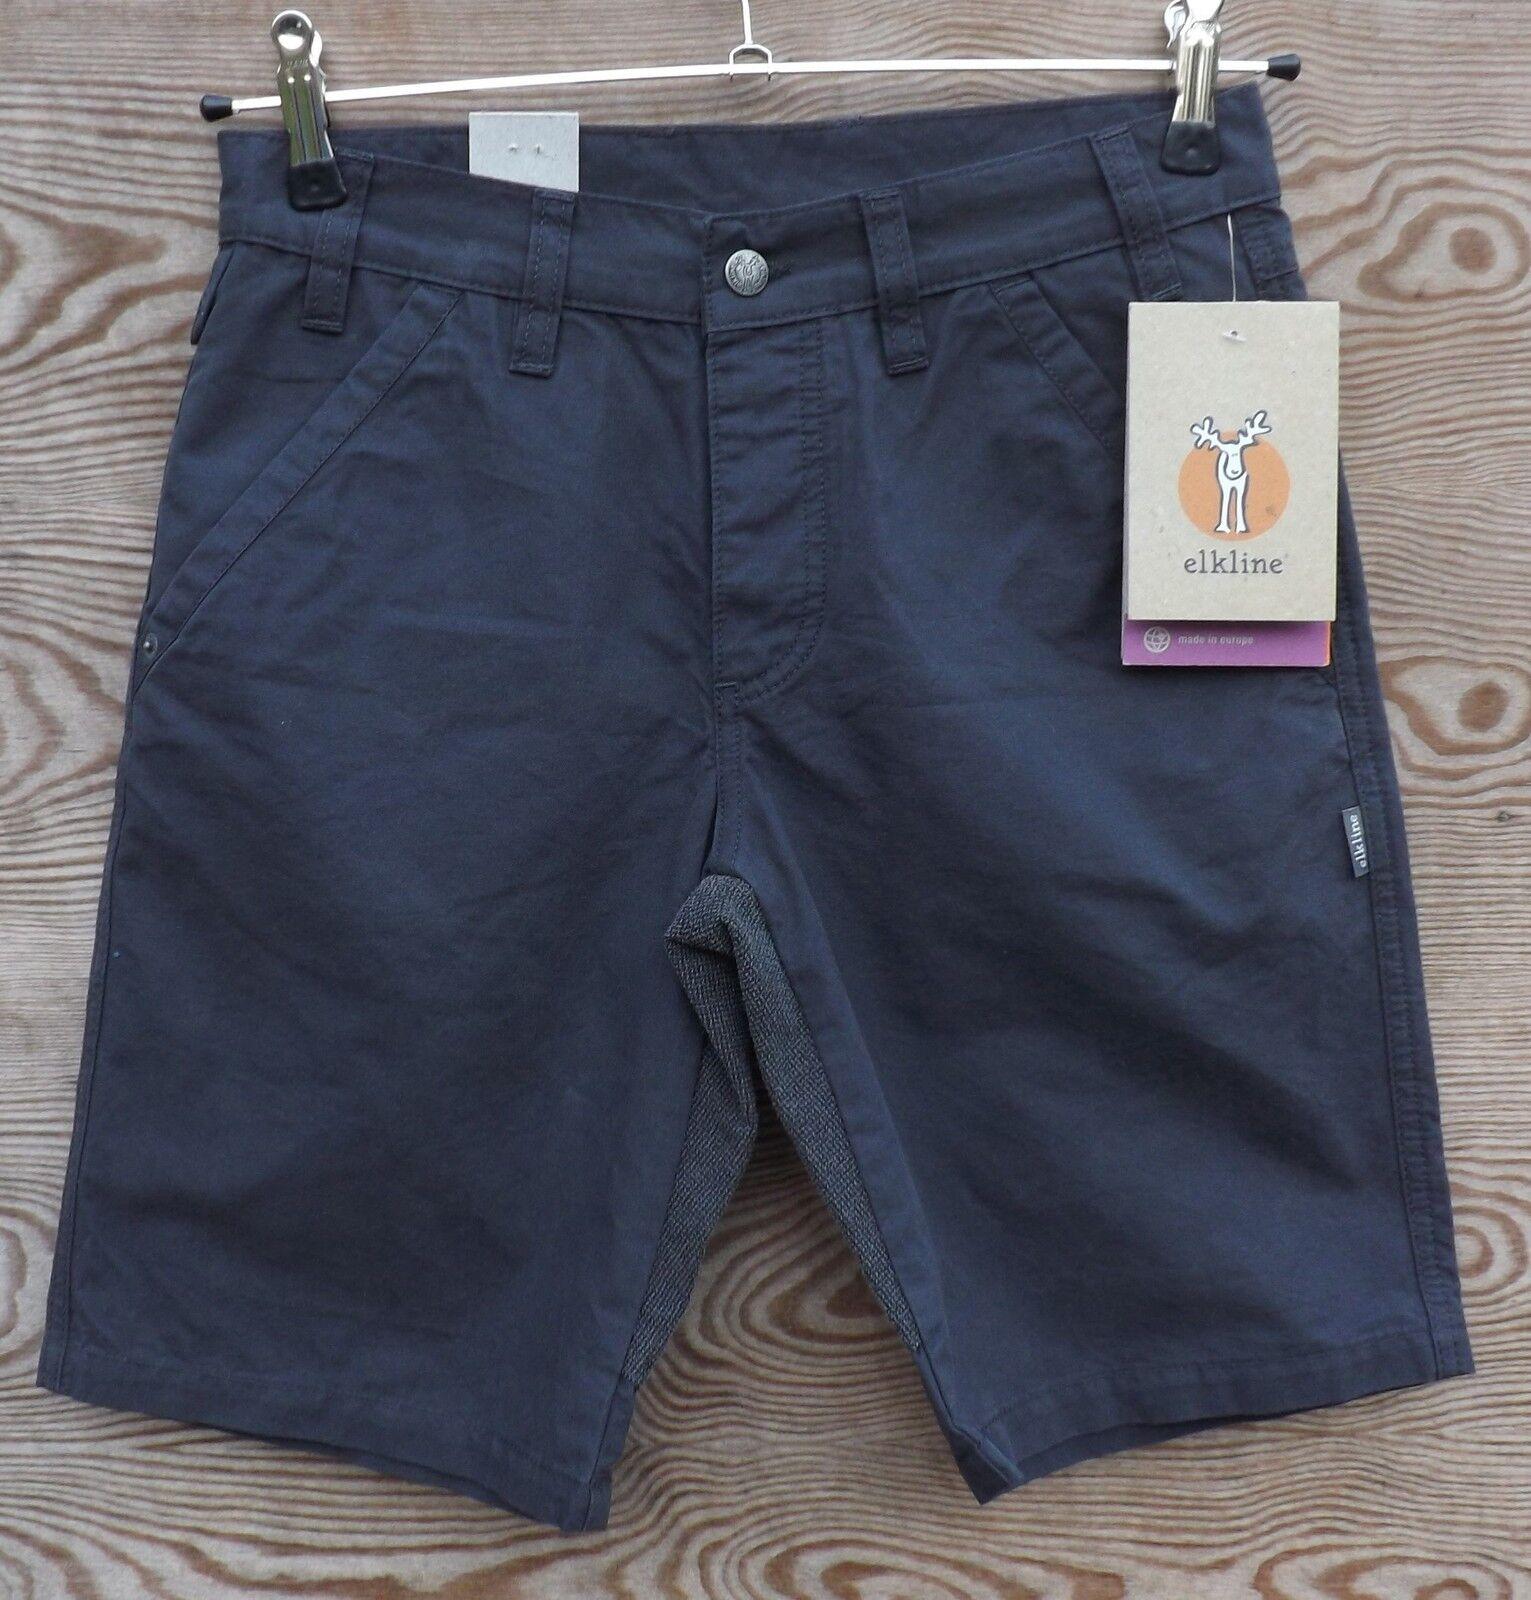 Elkline geht-was - shorts para Exterior con refuerzos hombre, antracita, talla S